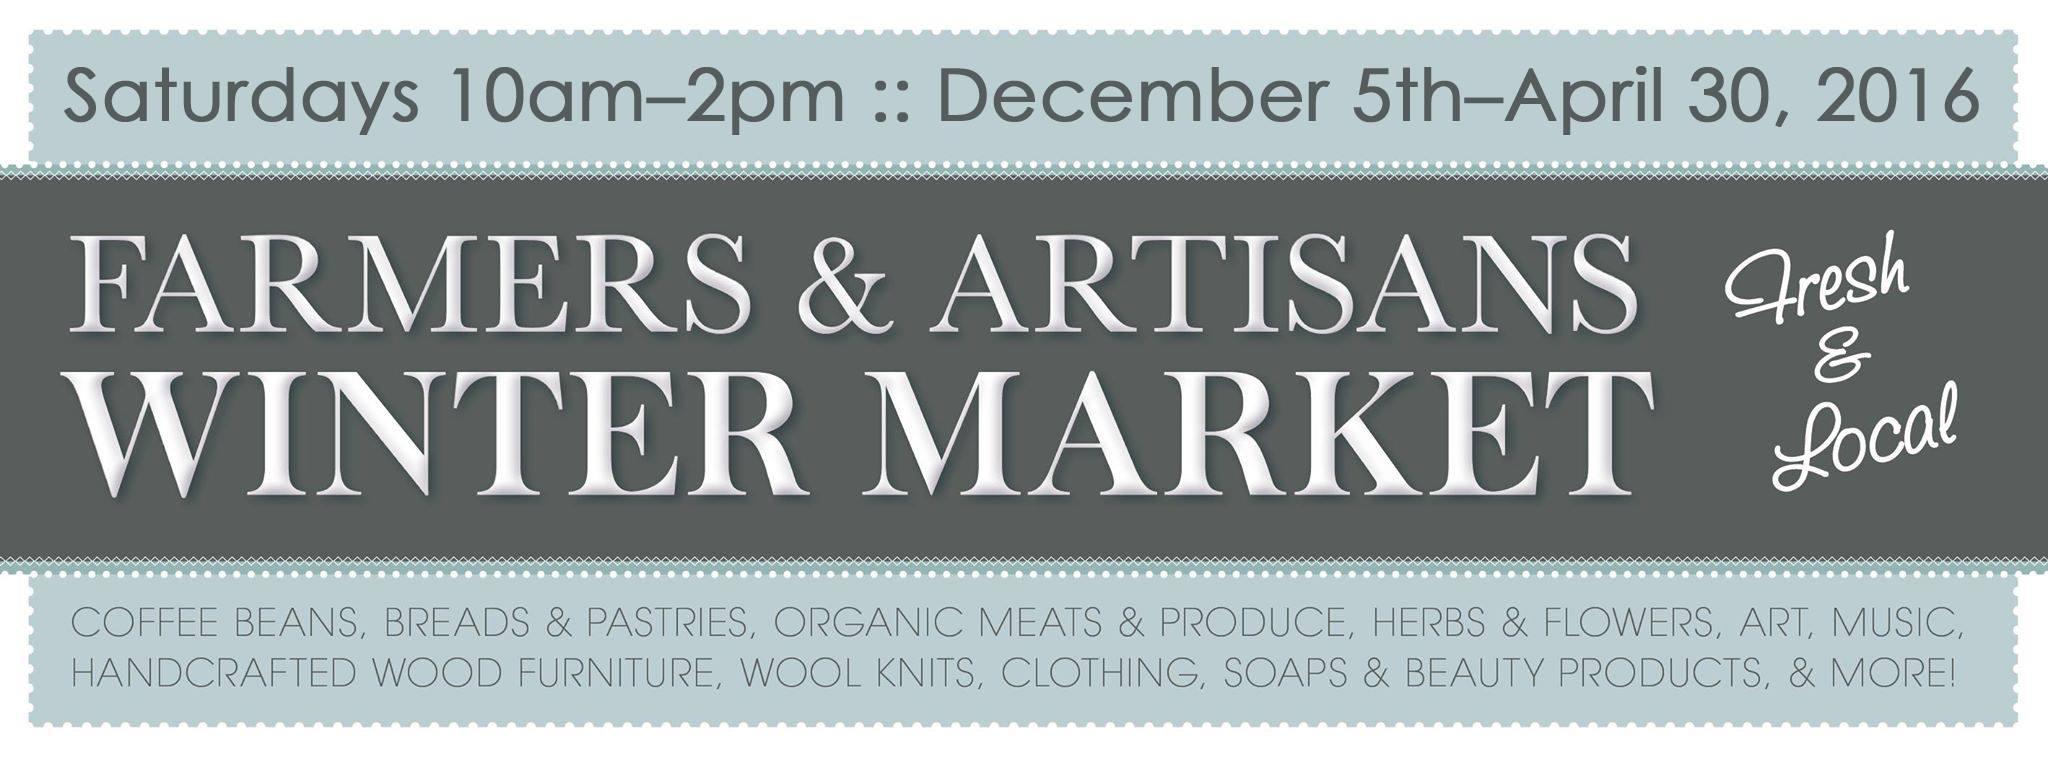 2016 Farmers & Artisans Winter Market